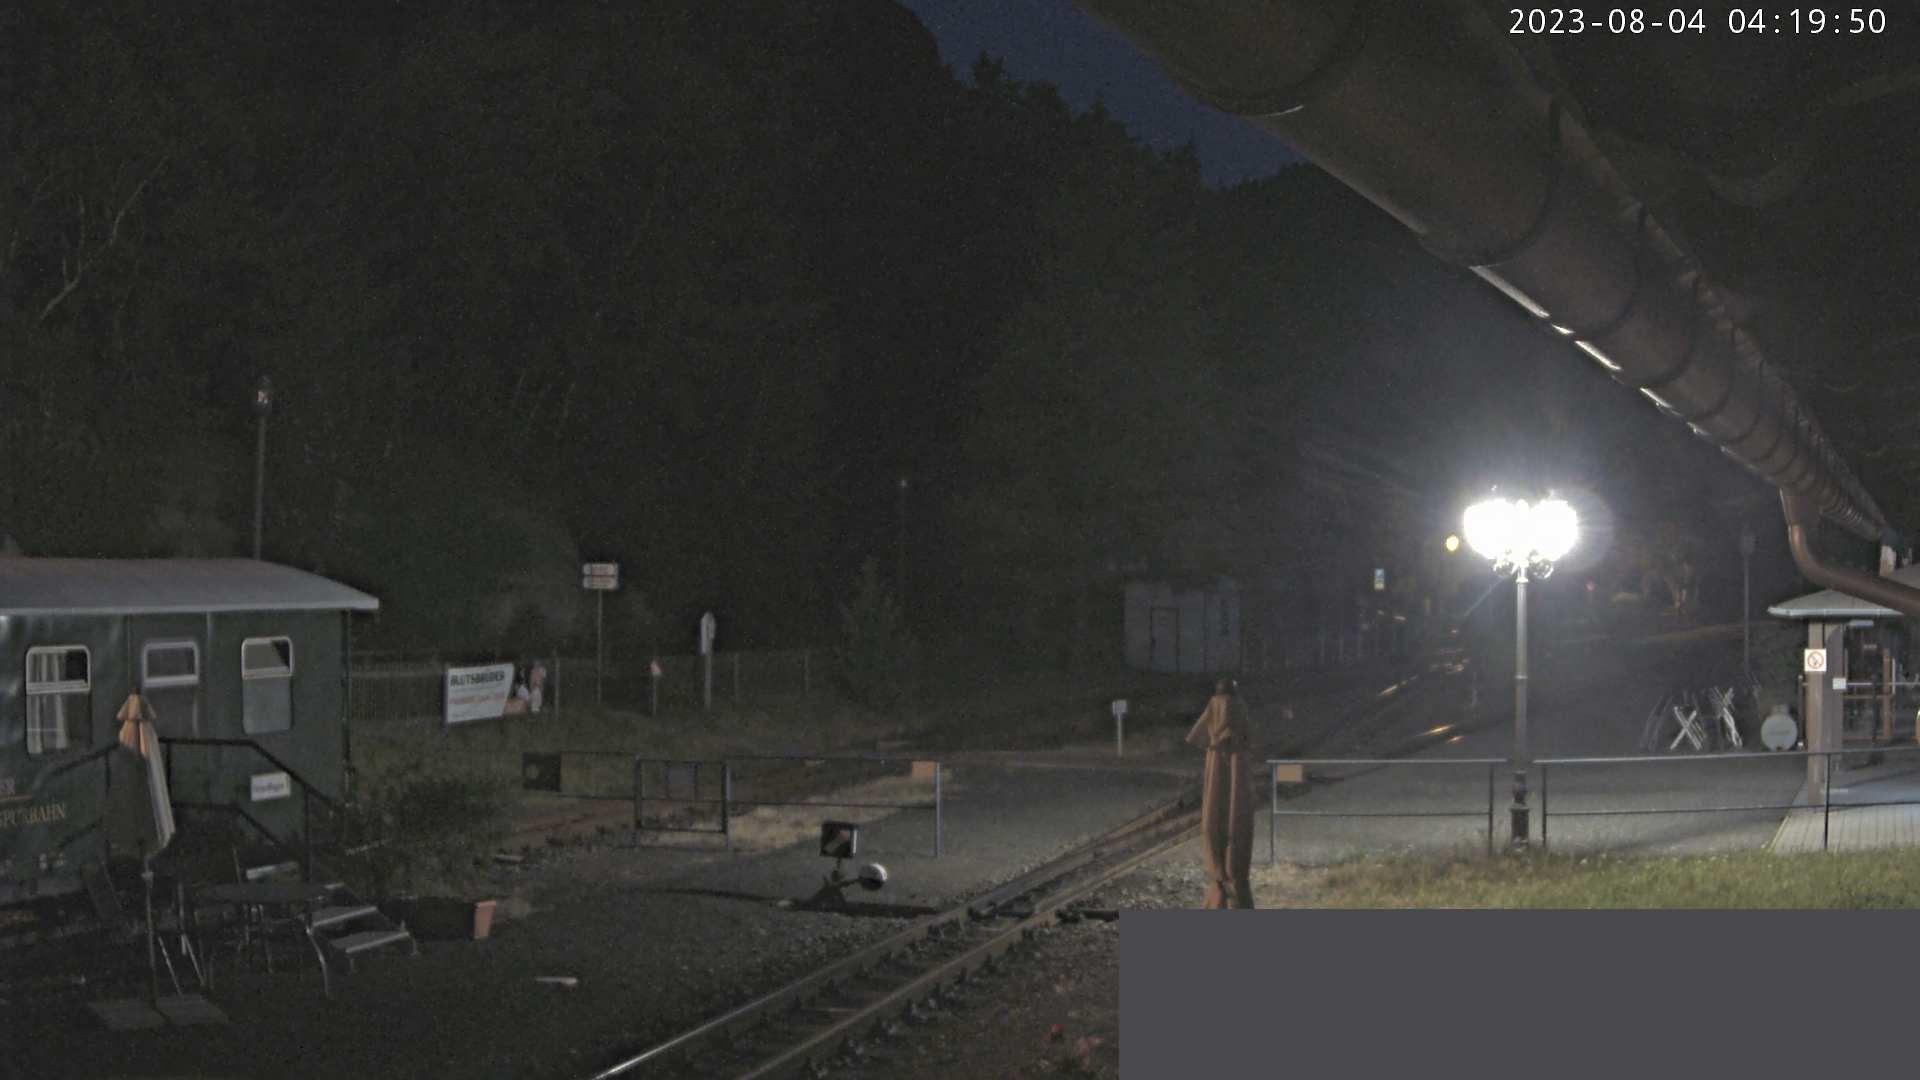 Bahnhof Oybin | aktualisiertes Bild